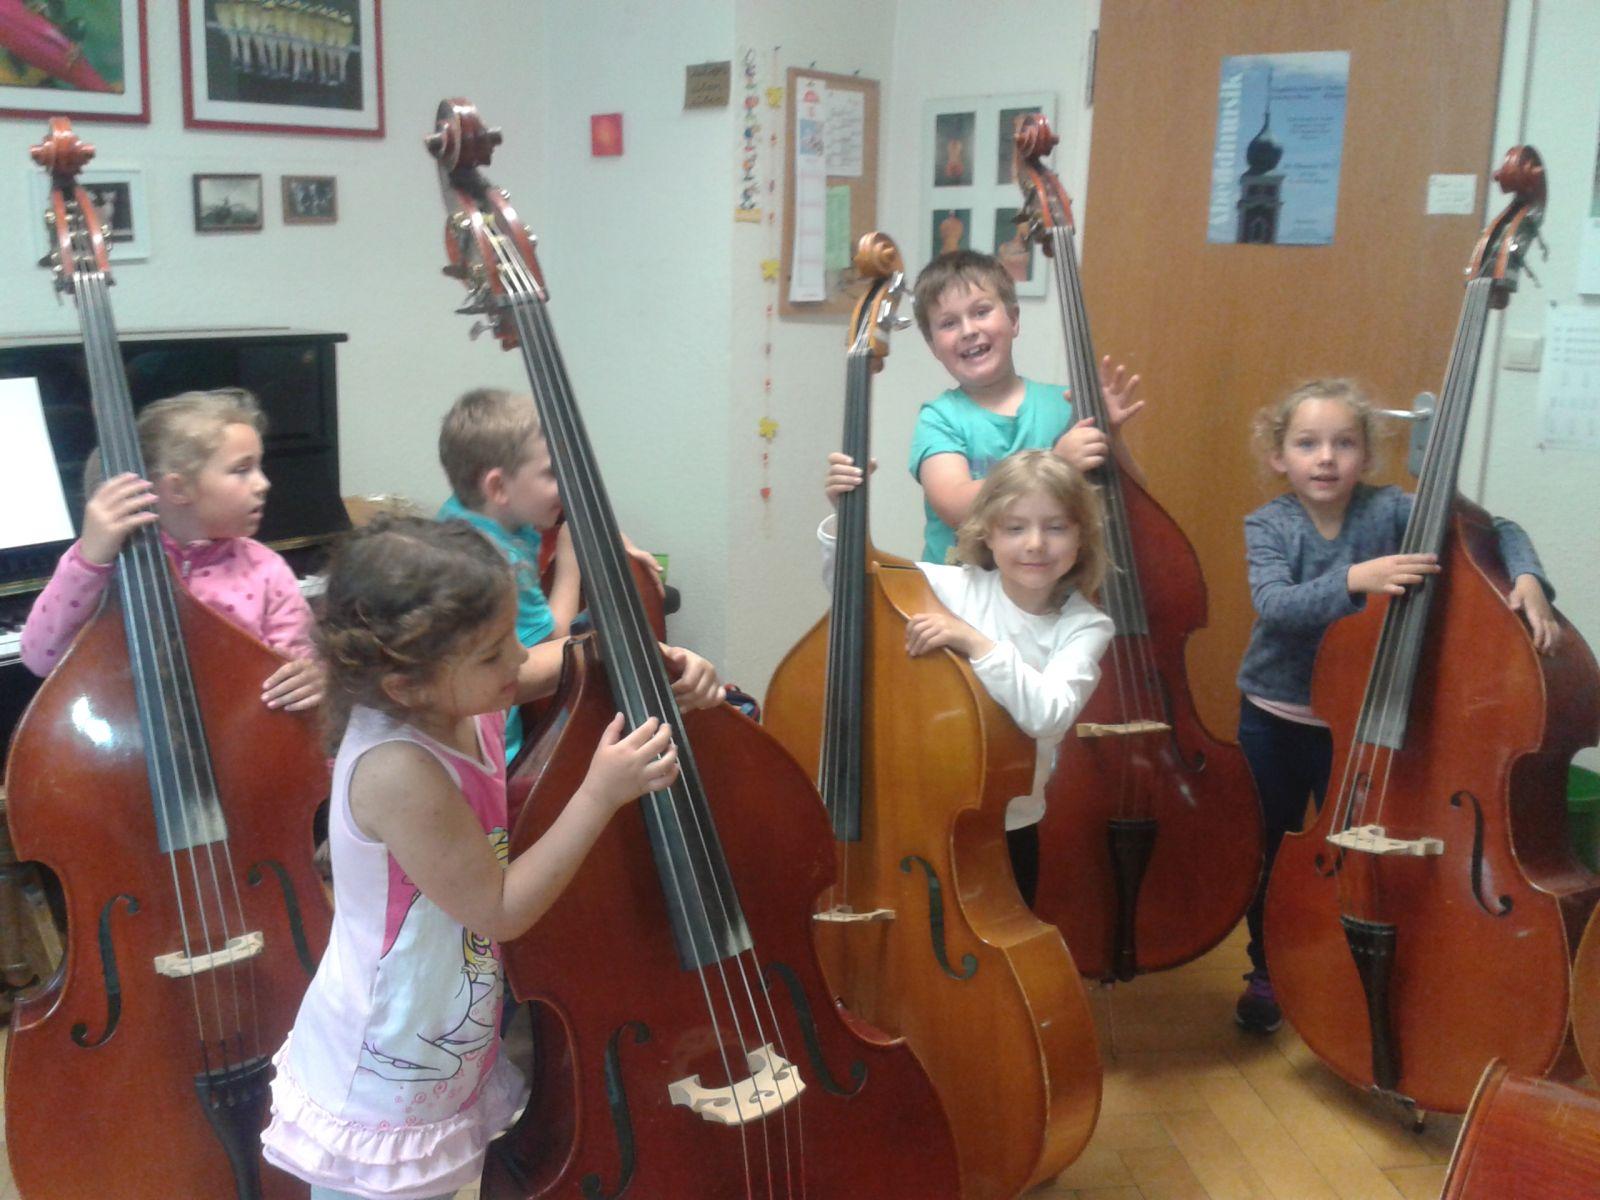 Elementare Musikpädagogik Instrumentenkarussell